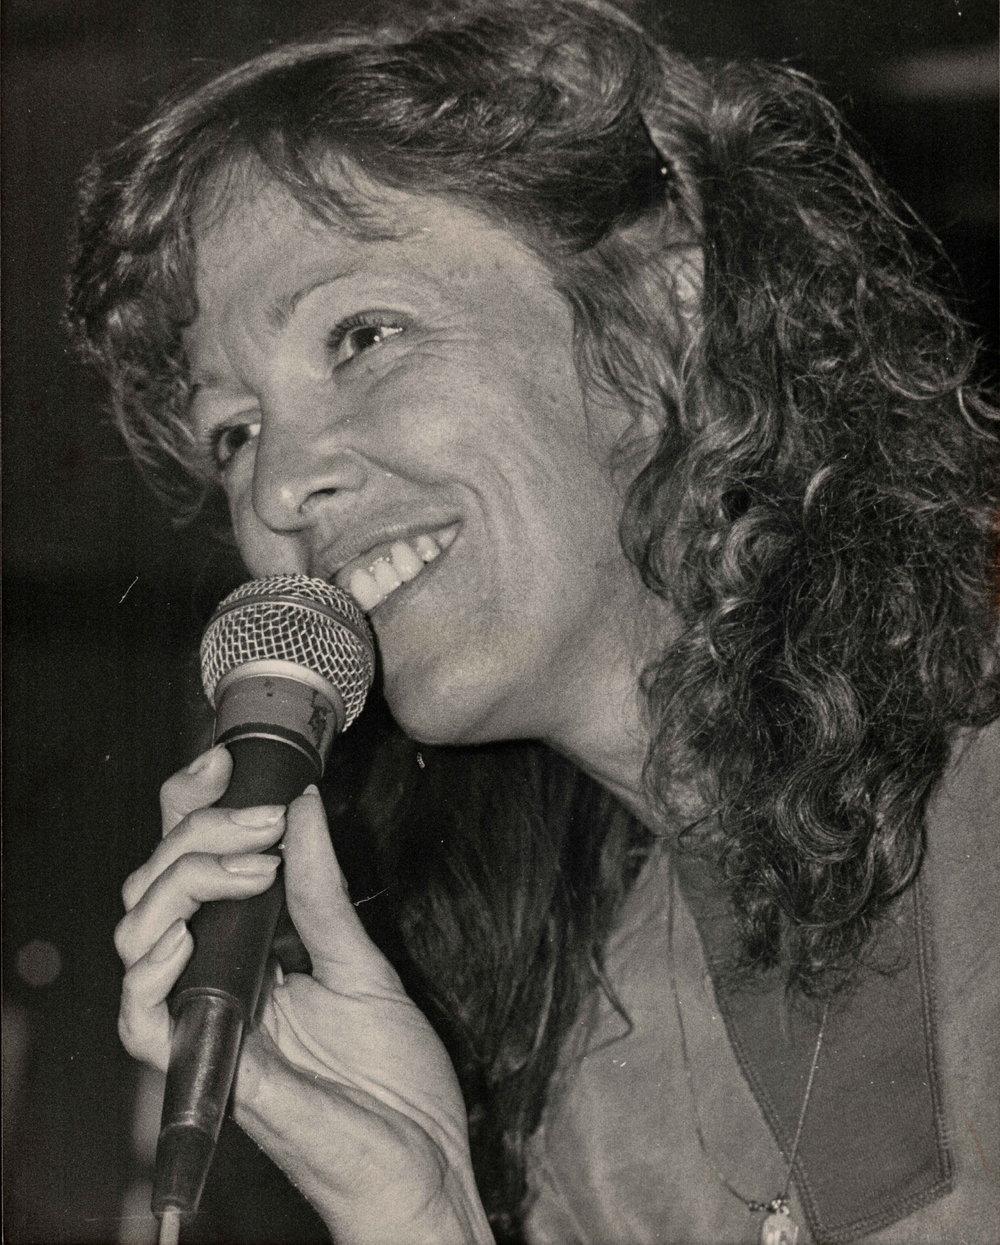 Kerrie Biddell